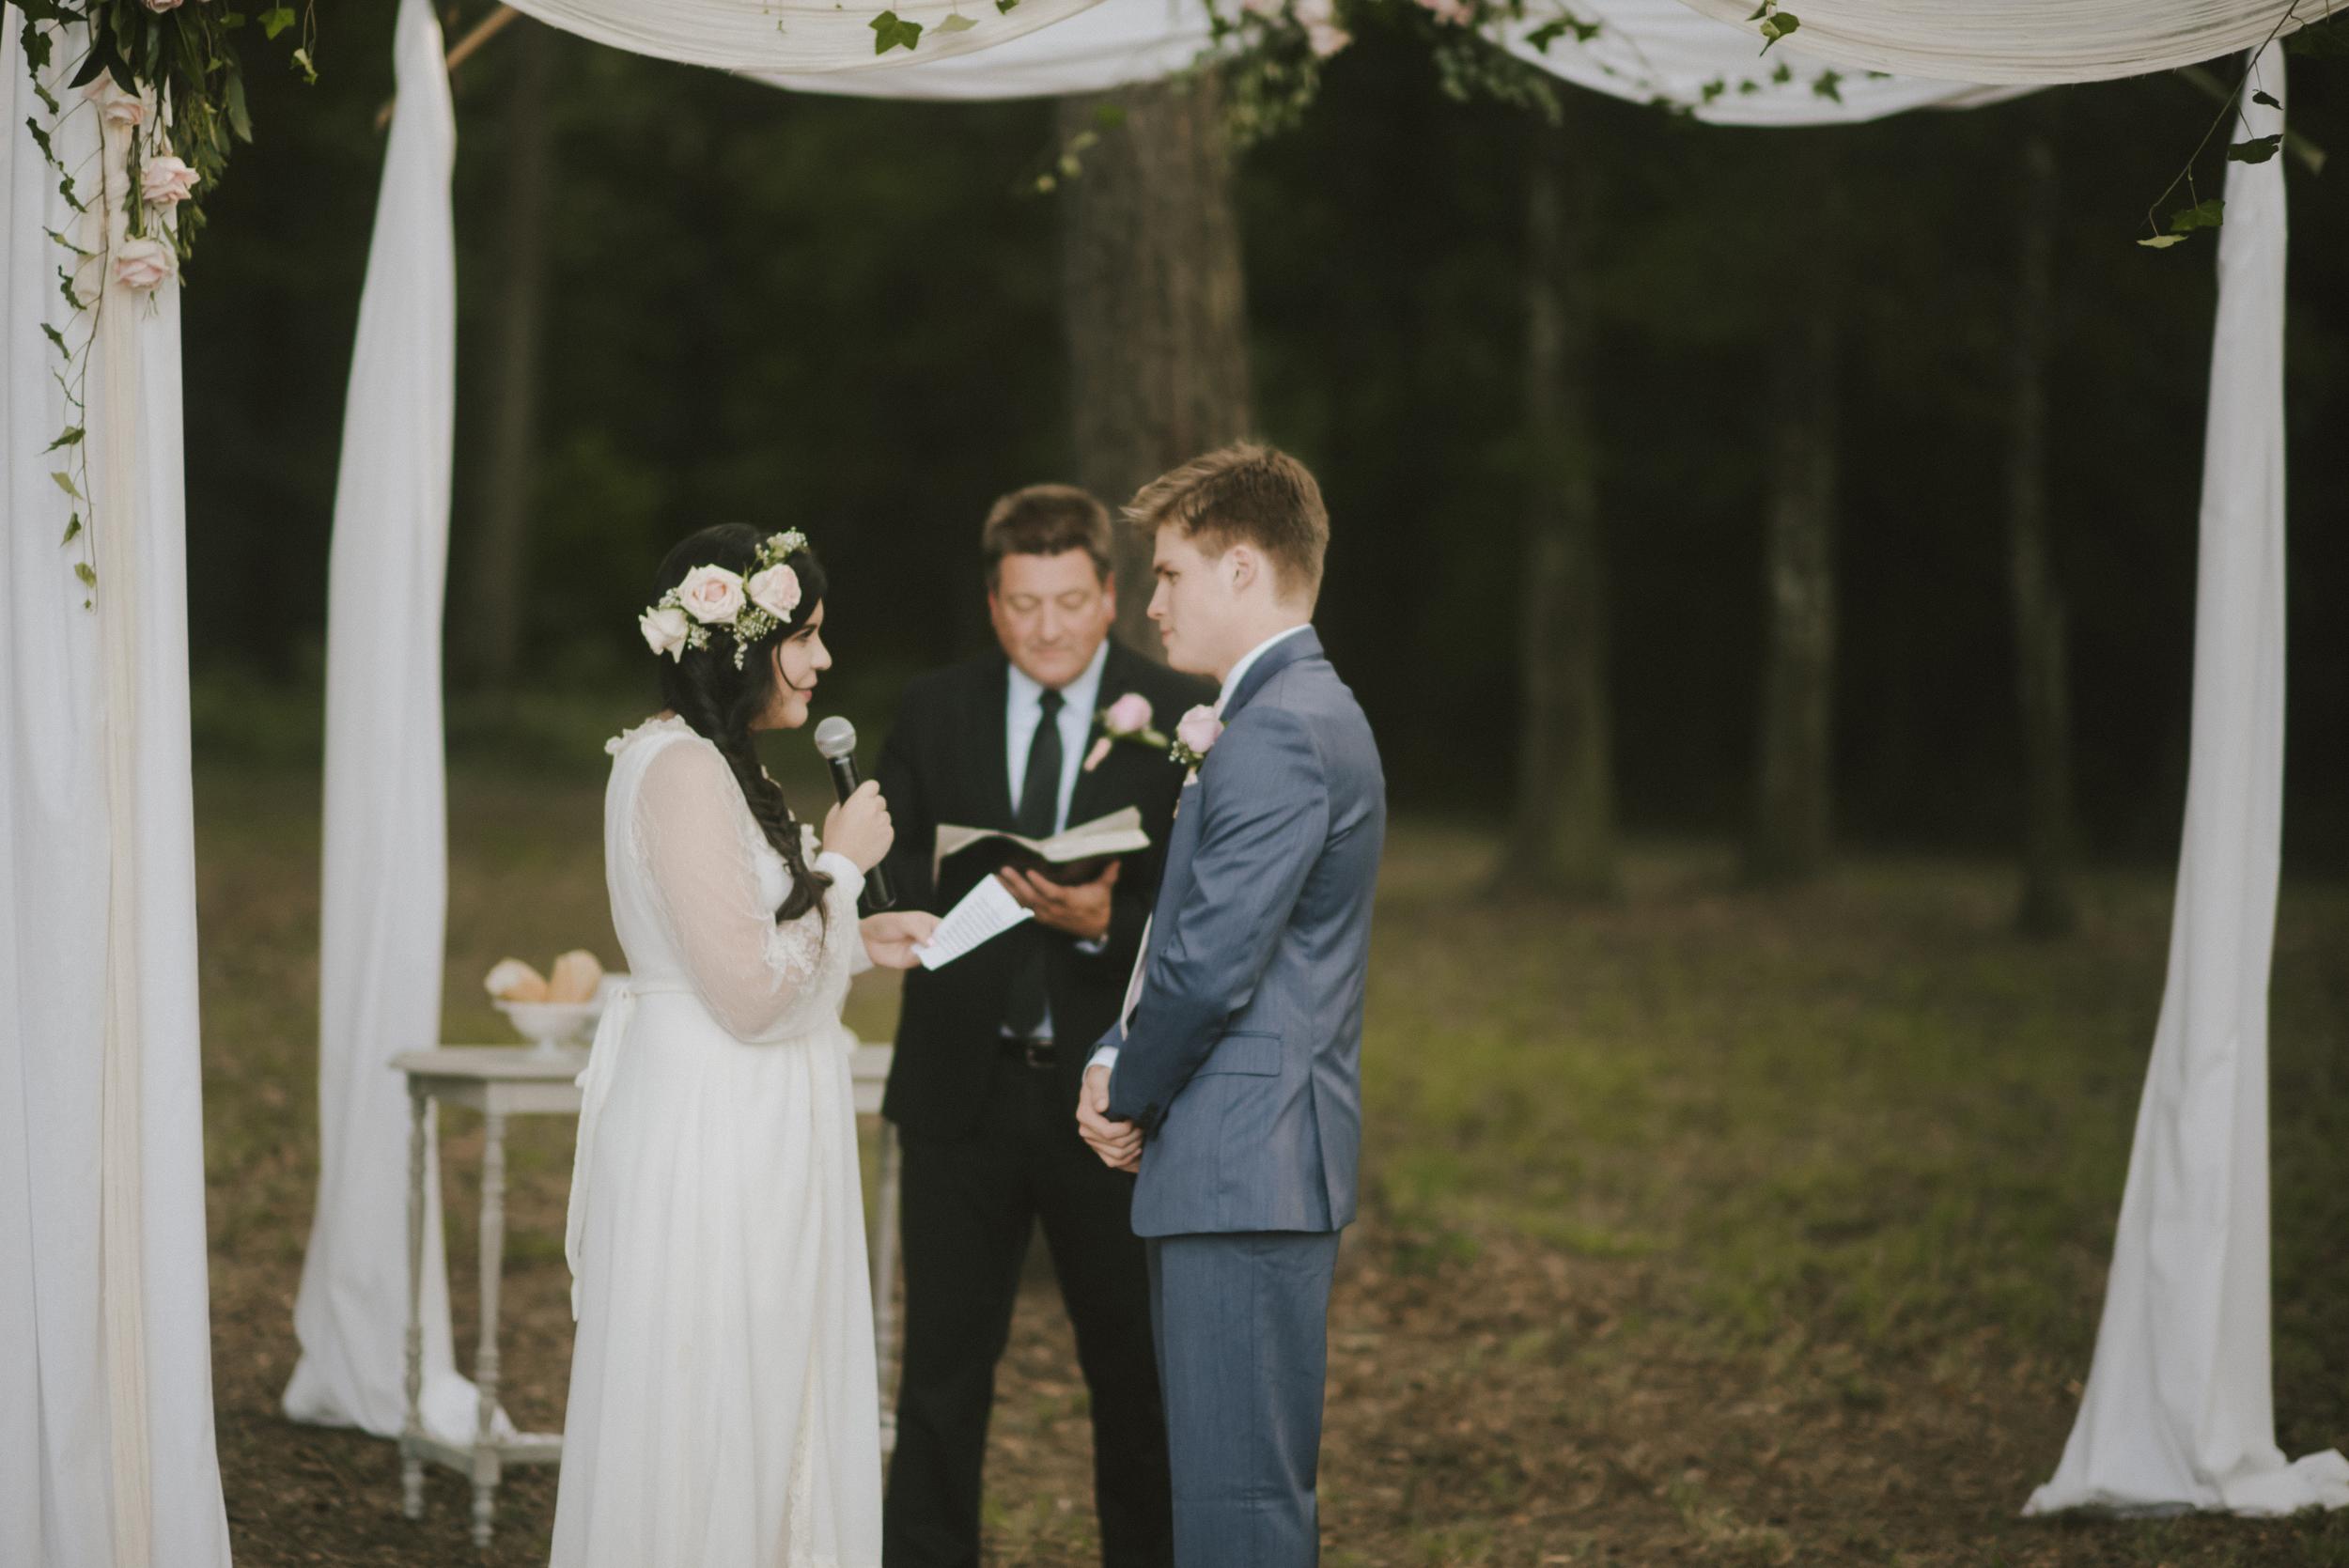 ofRen_weddingphotographer-133.jpg